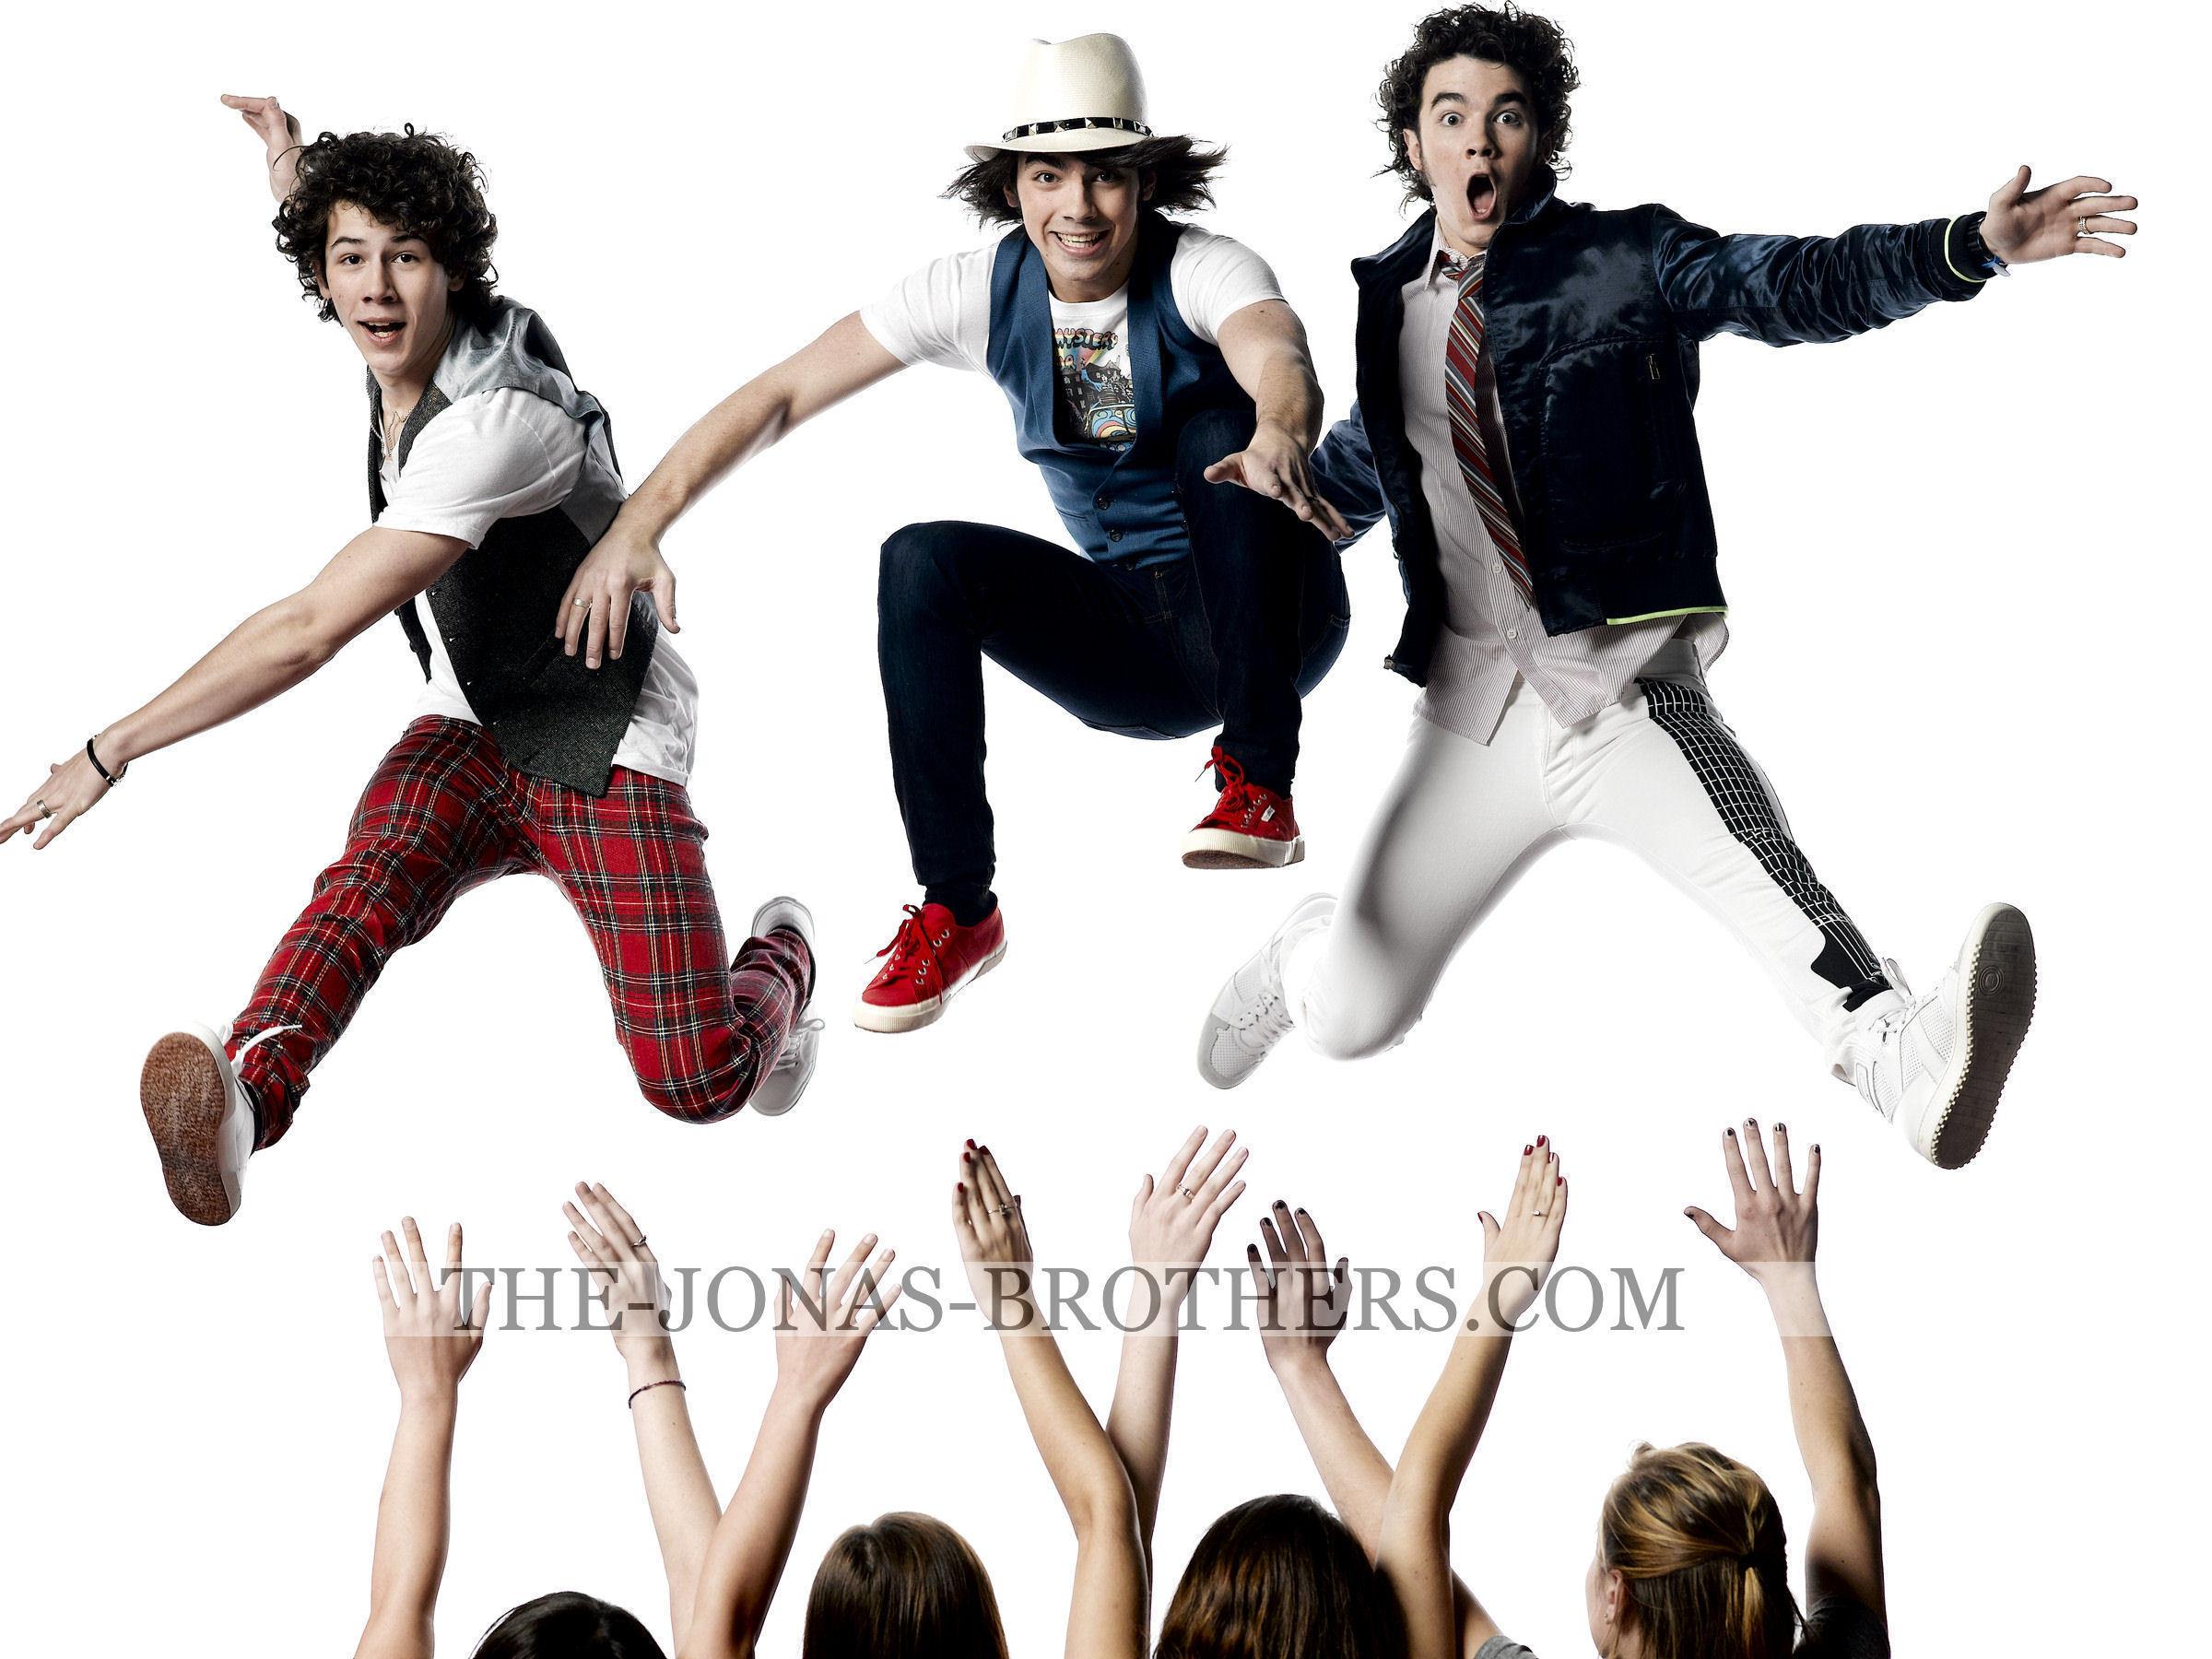 http://images2.fanpop.com/images/photos/3900000/Jonas-Brothers-jb-3962113-2400-1800.jpg